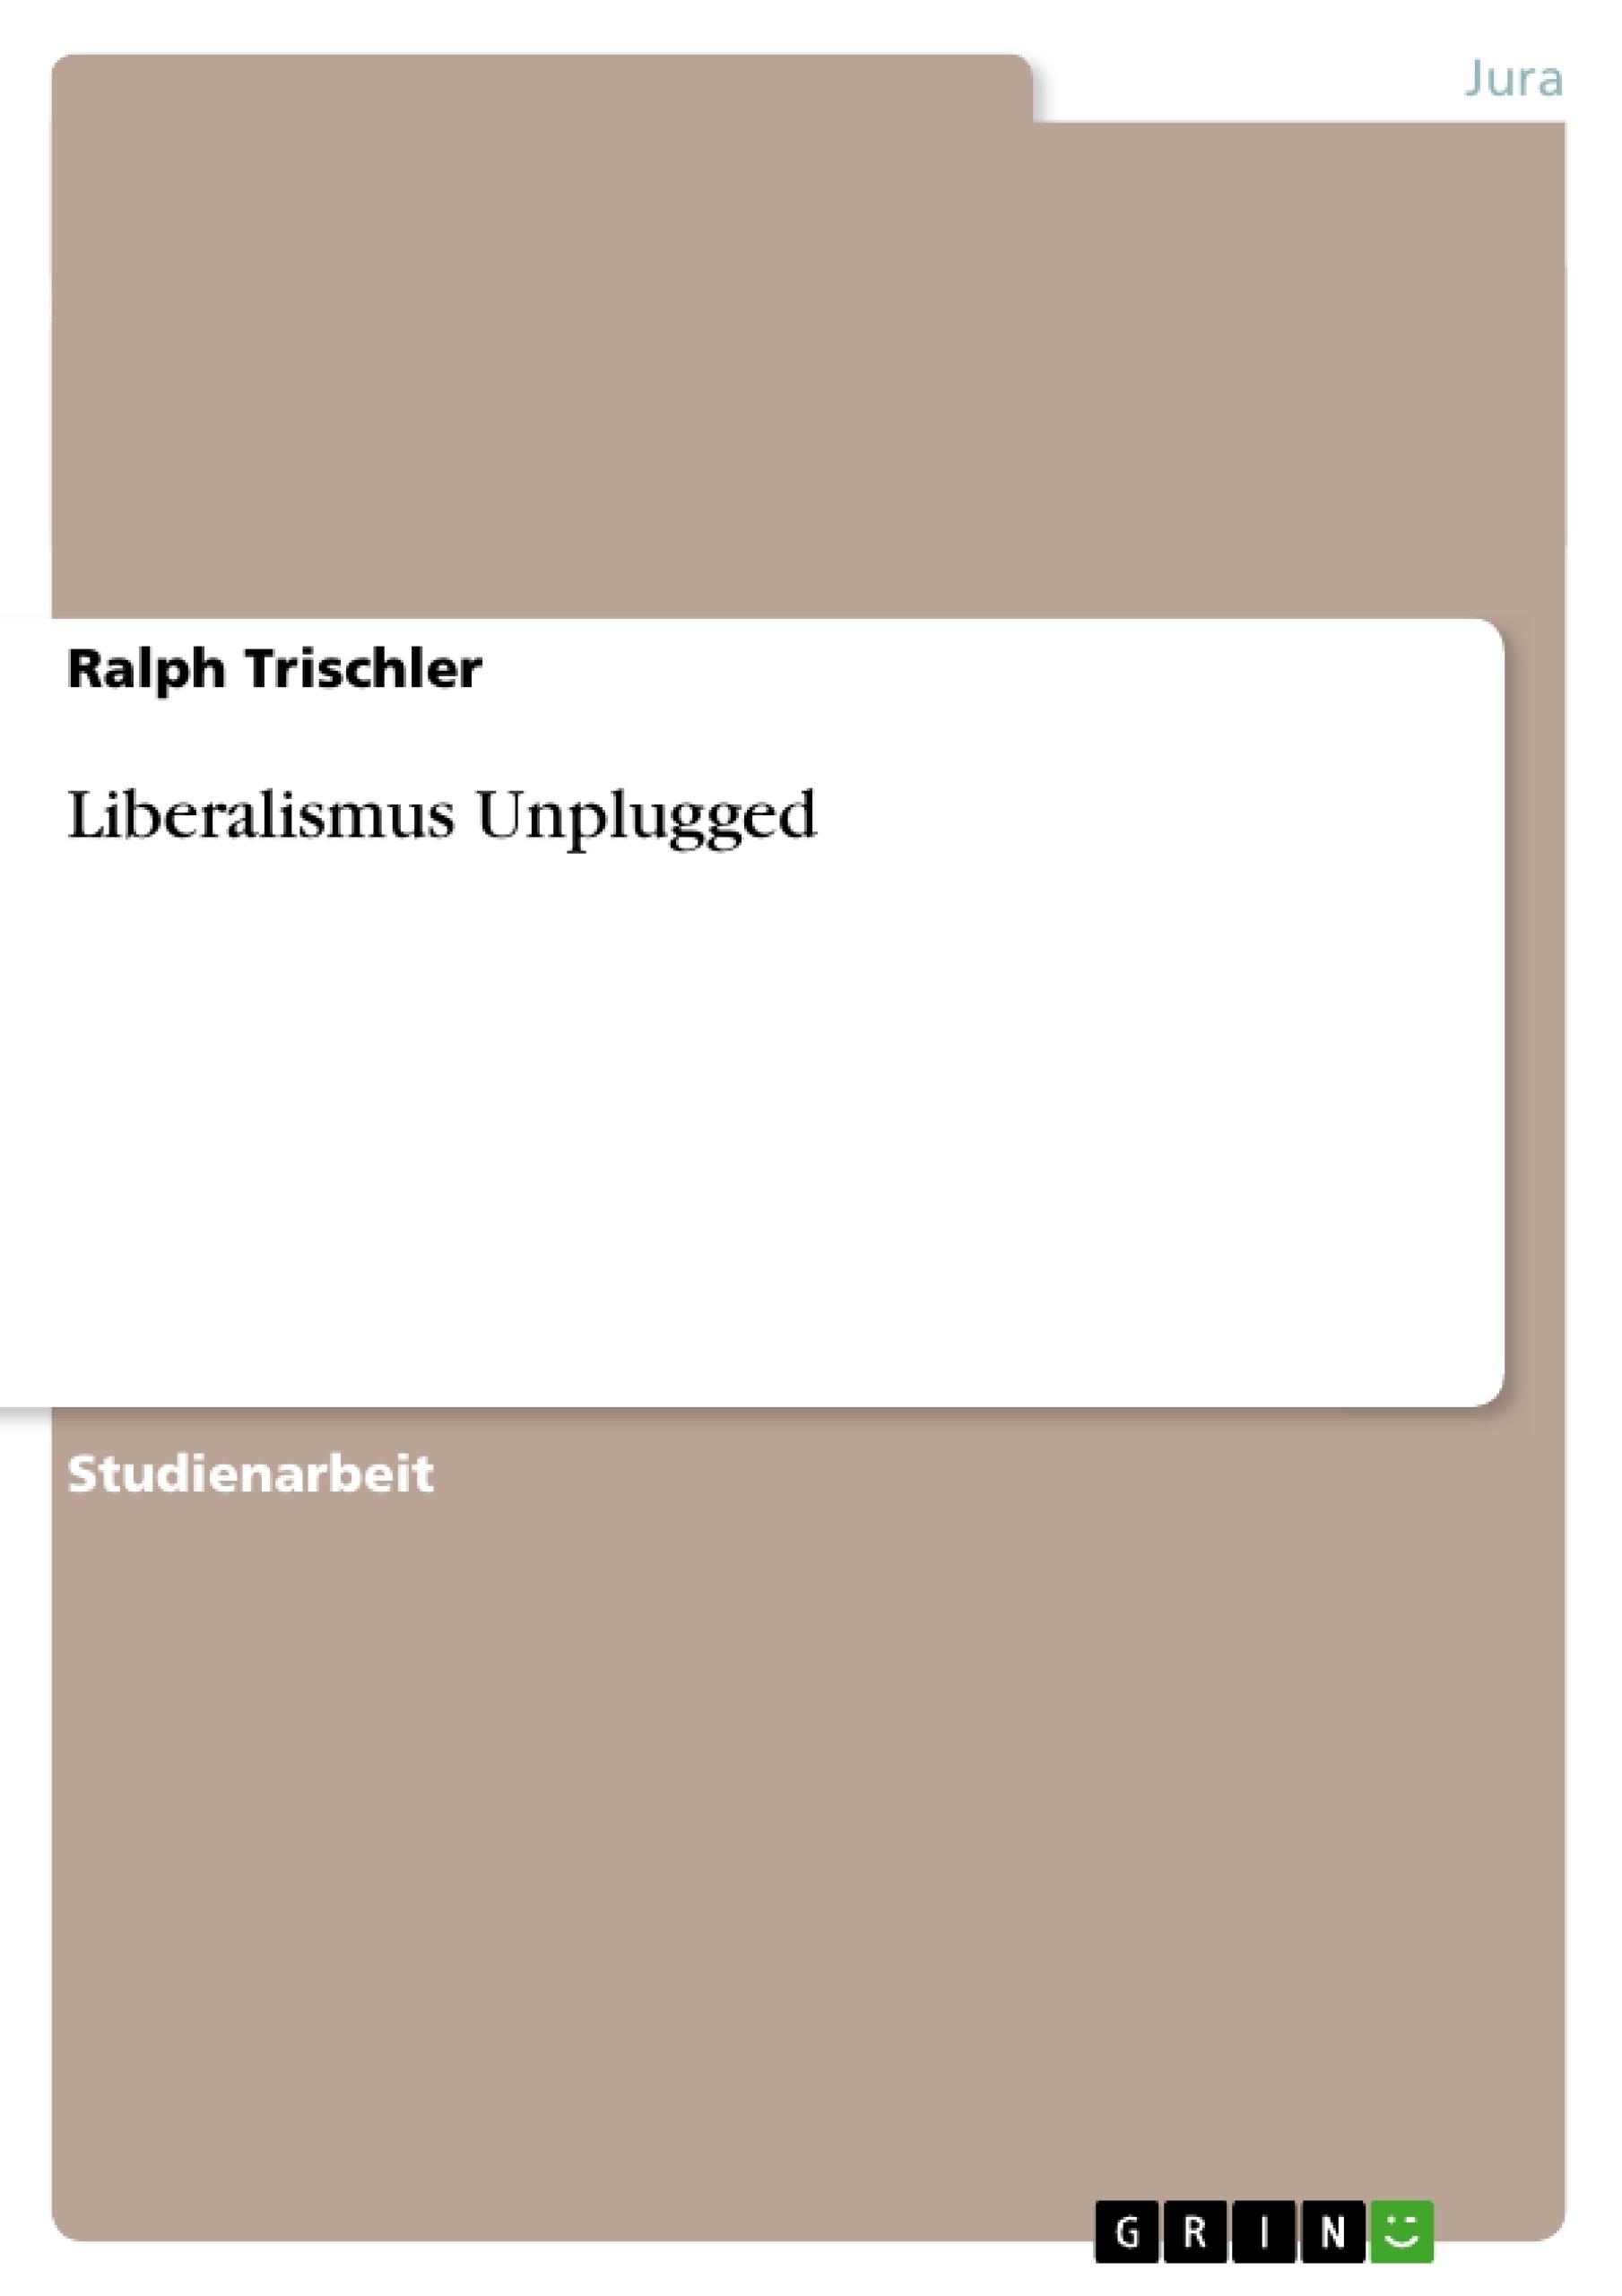 Titel: Liberalismus Unplugged